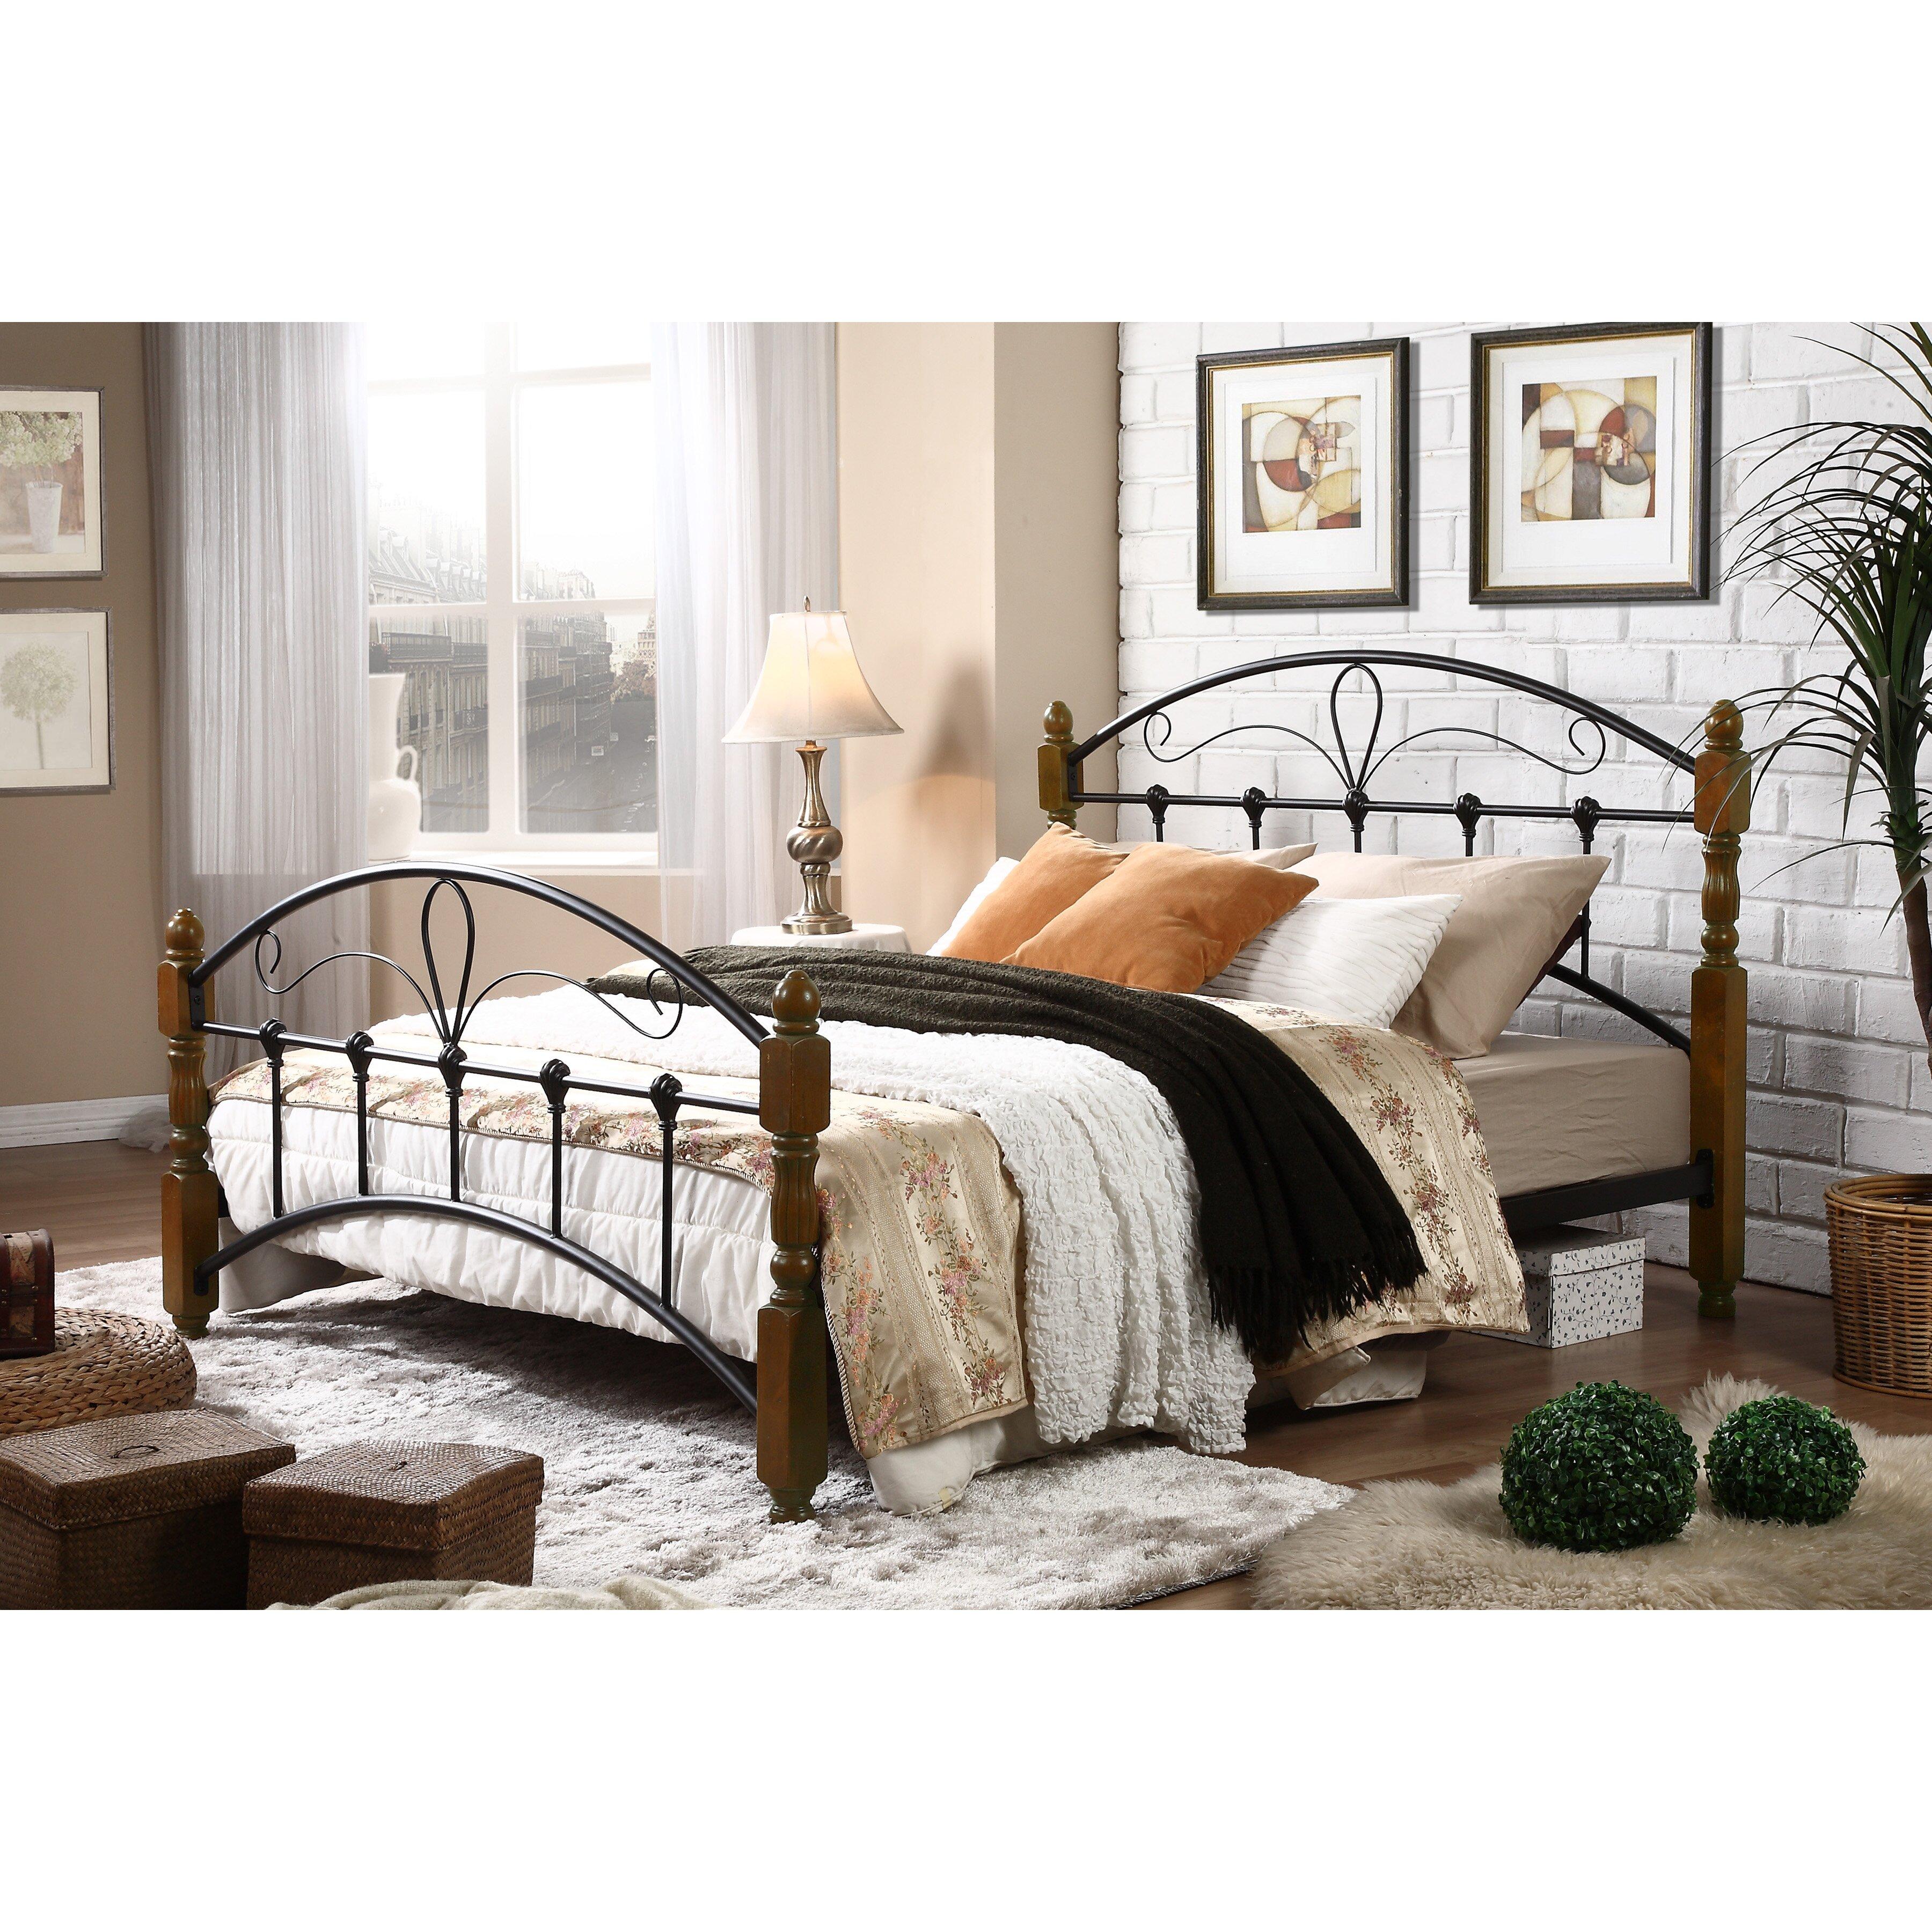 wholesale interiors baxton studio queen platform bed reviews wayfair. Black Bedroom Furniture Sets. Home Design Ideas